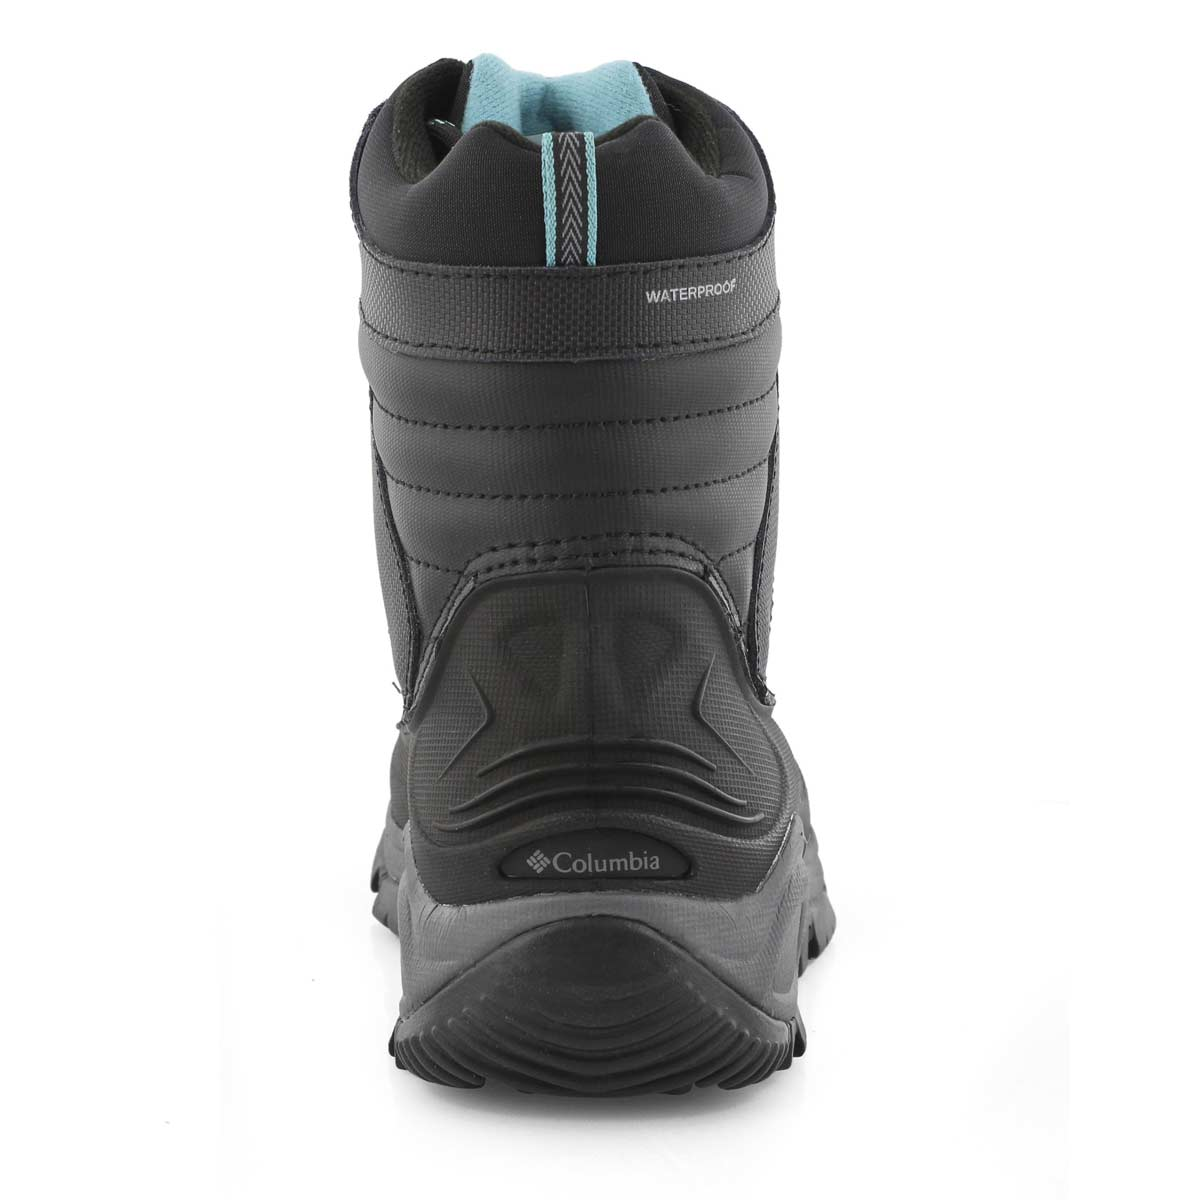 Lds Bugaboot III black wtpf winter boot